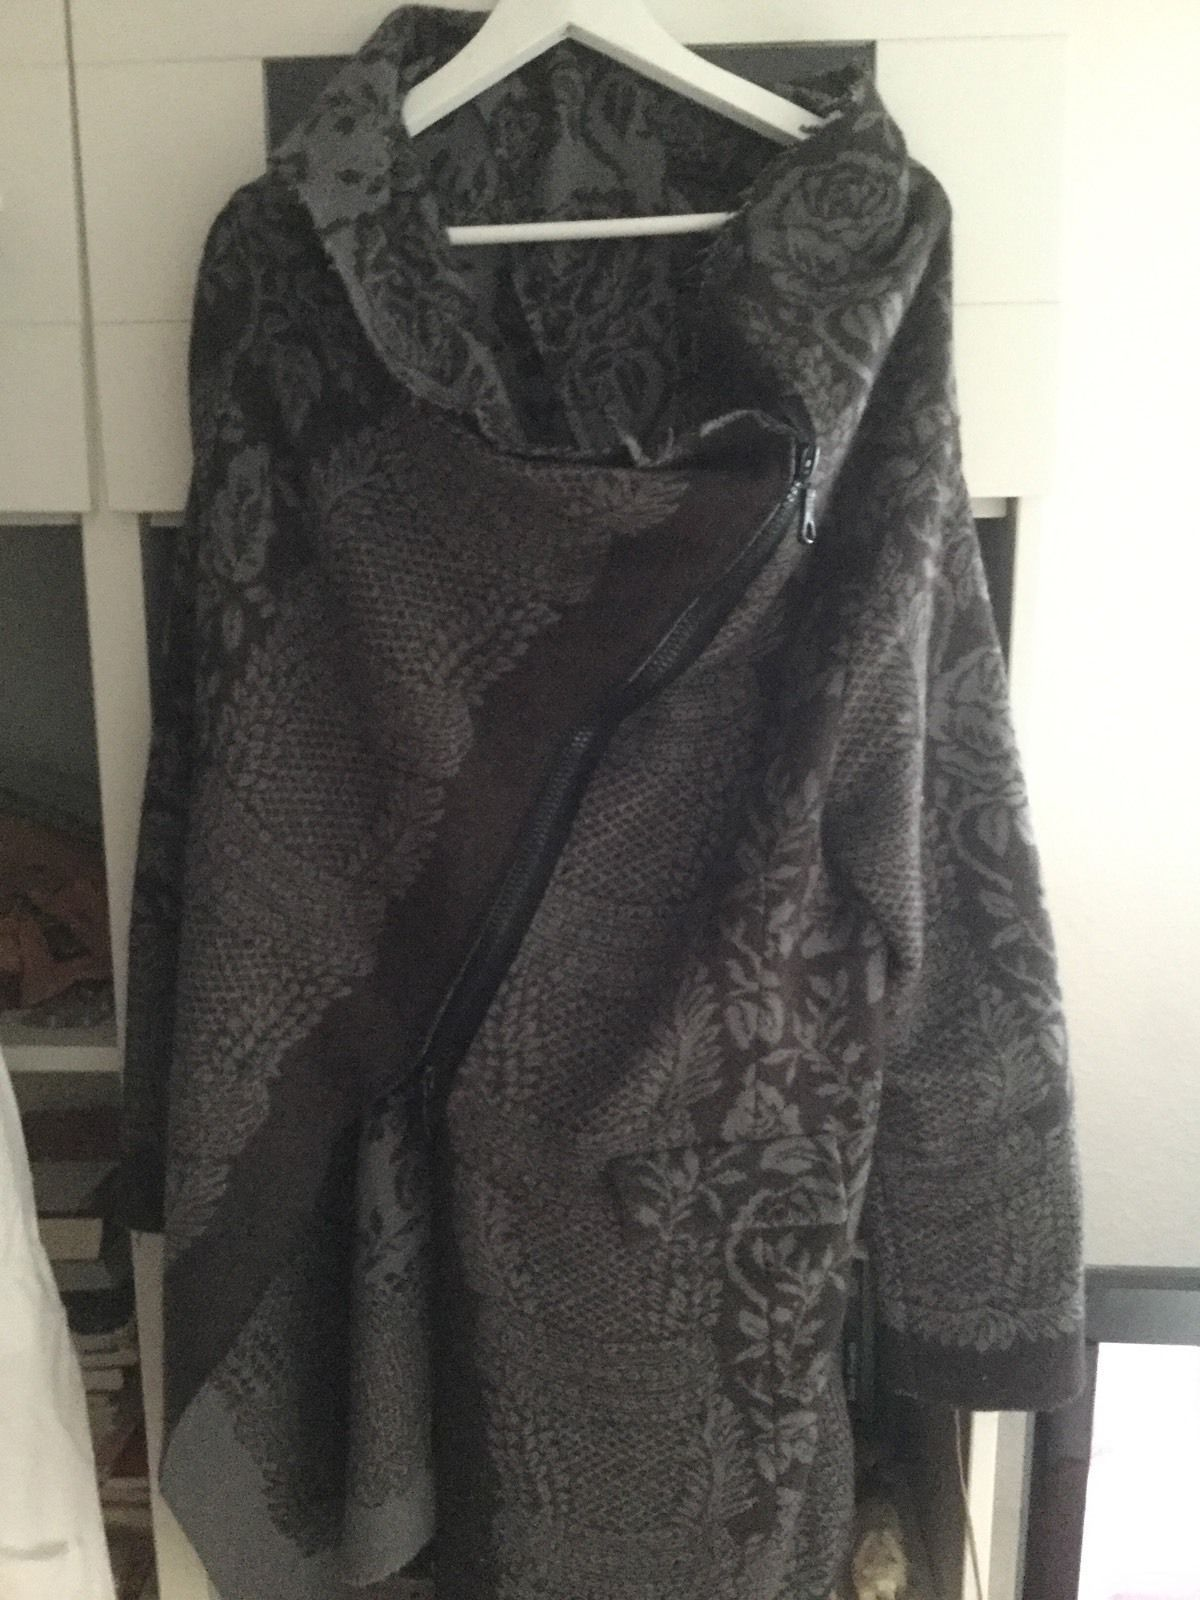 Rundholz Woll Jacke Gr M | eBay